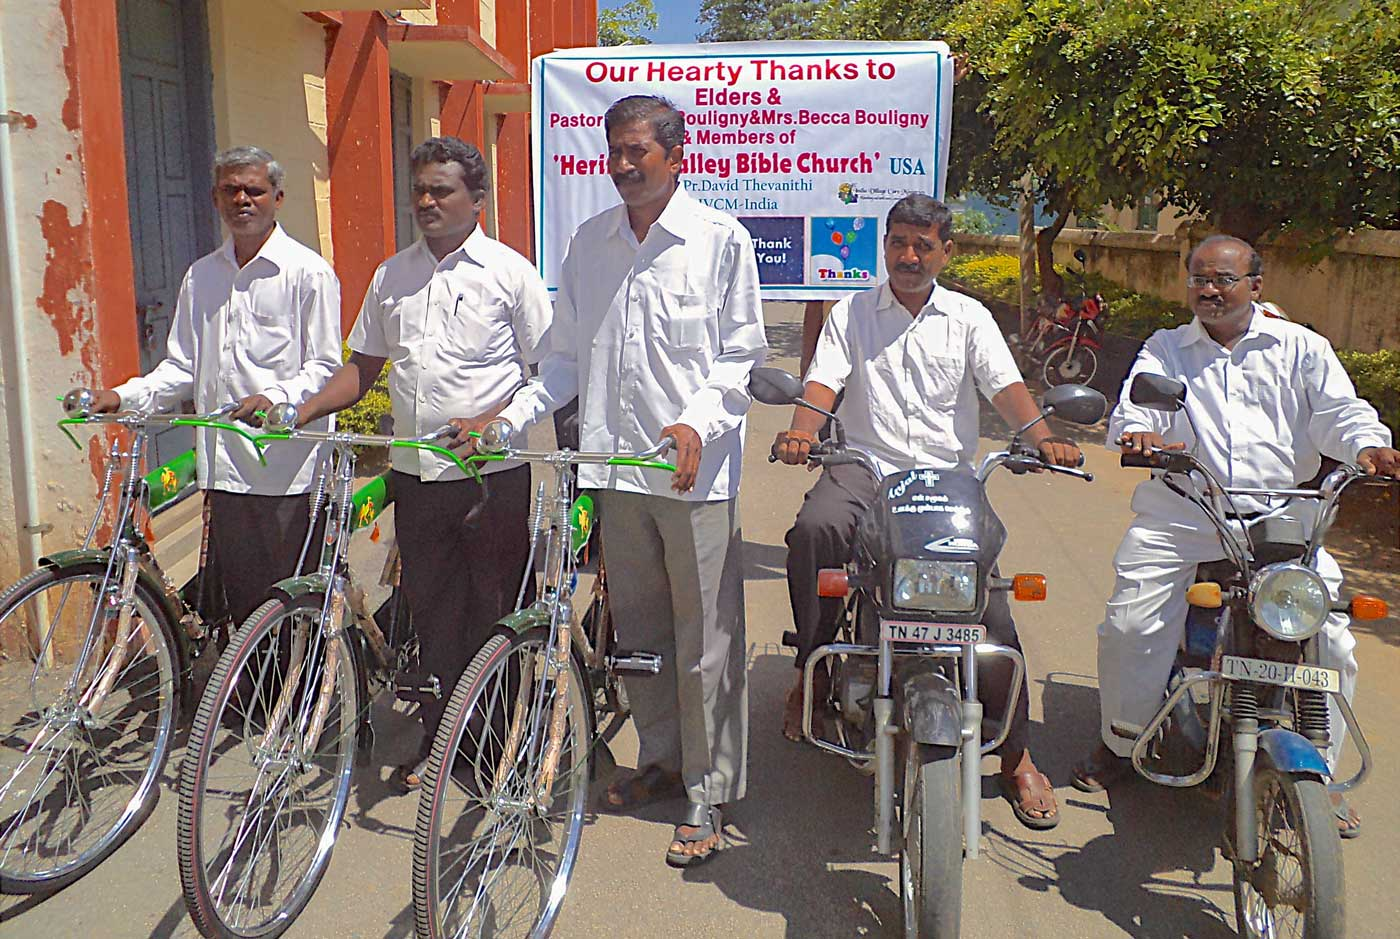 Bikes and bicycles, pastors